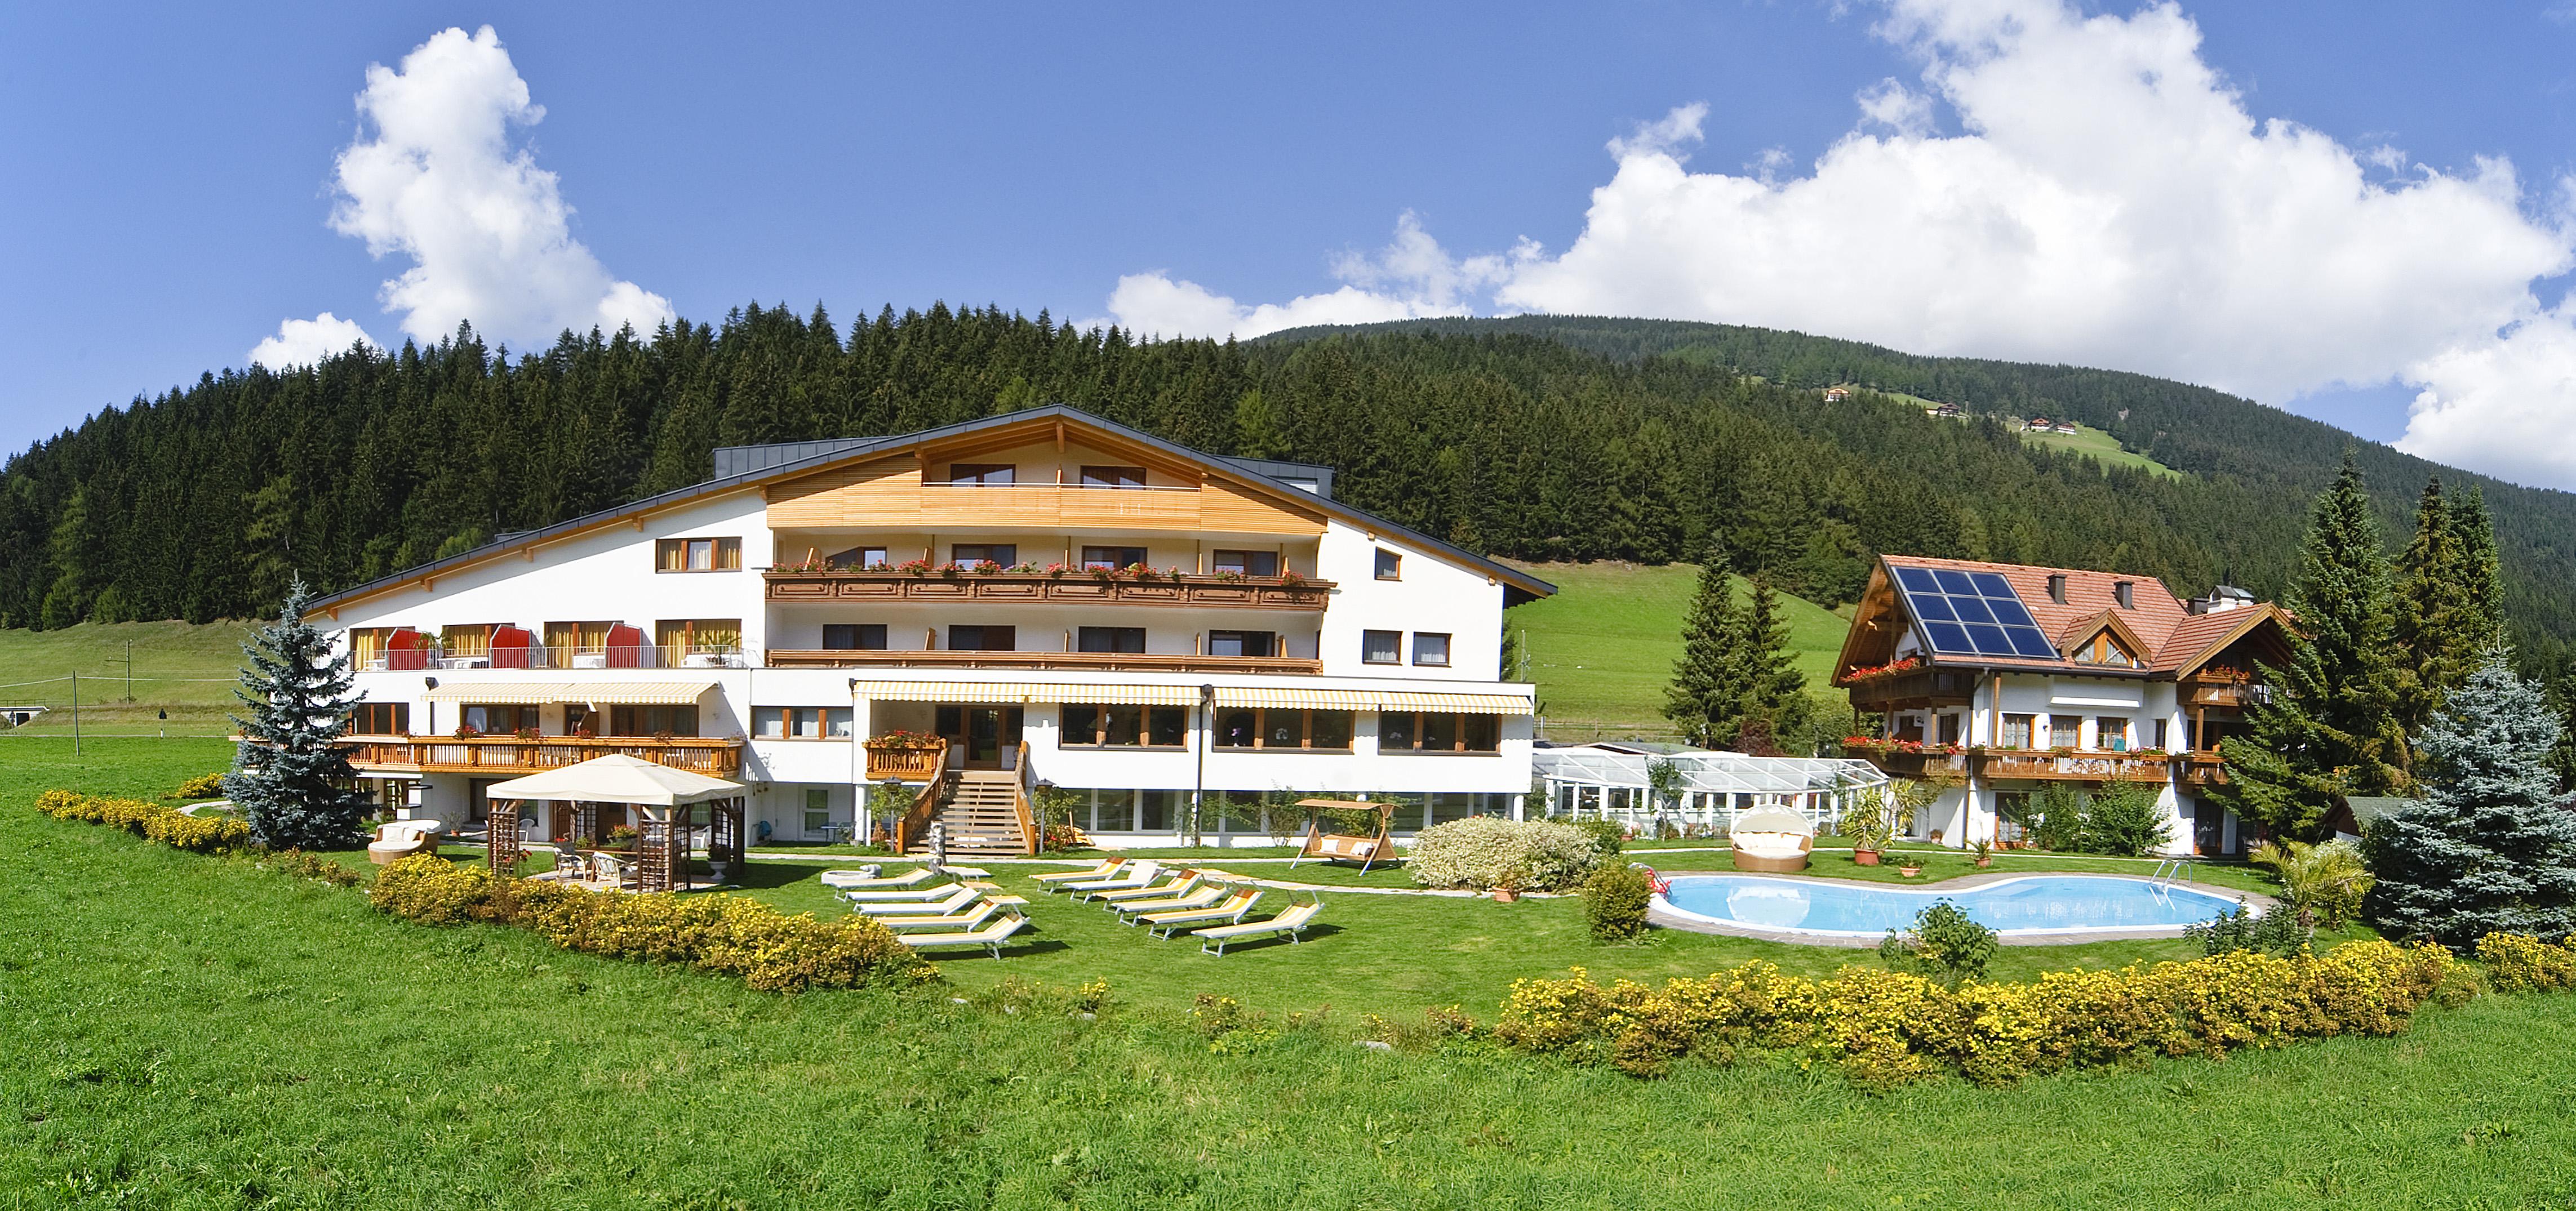 San Candido Villa Waldheim